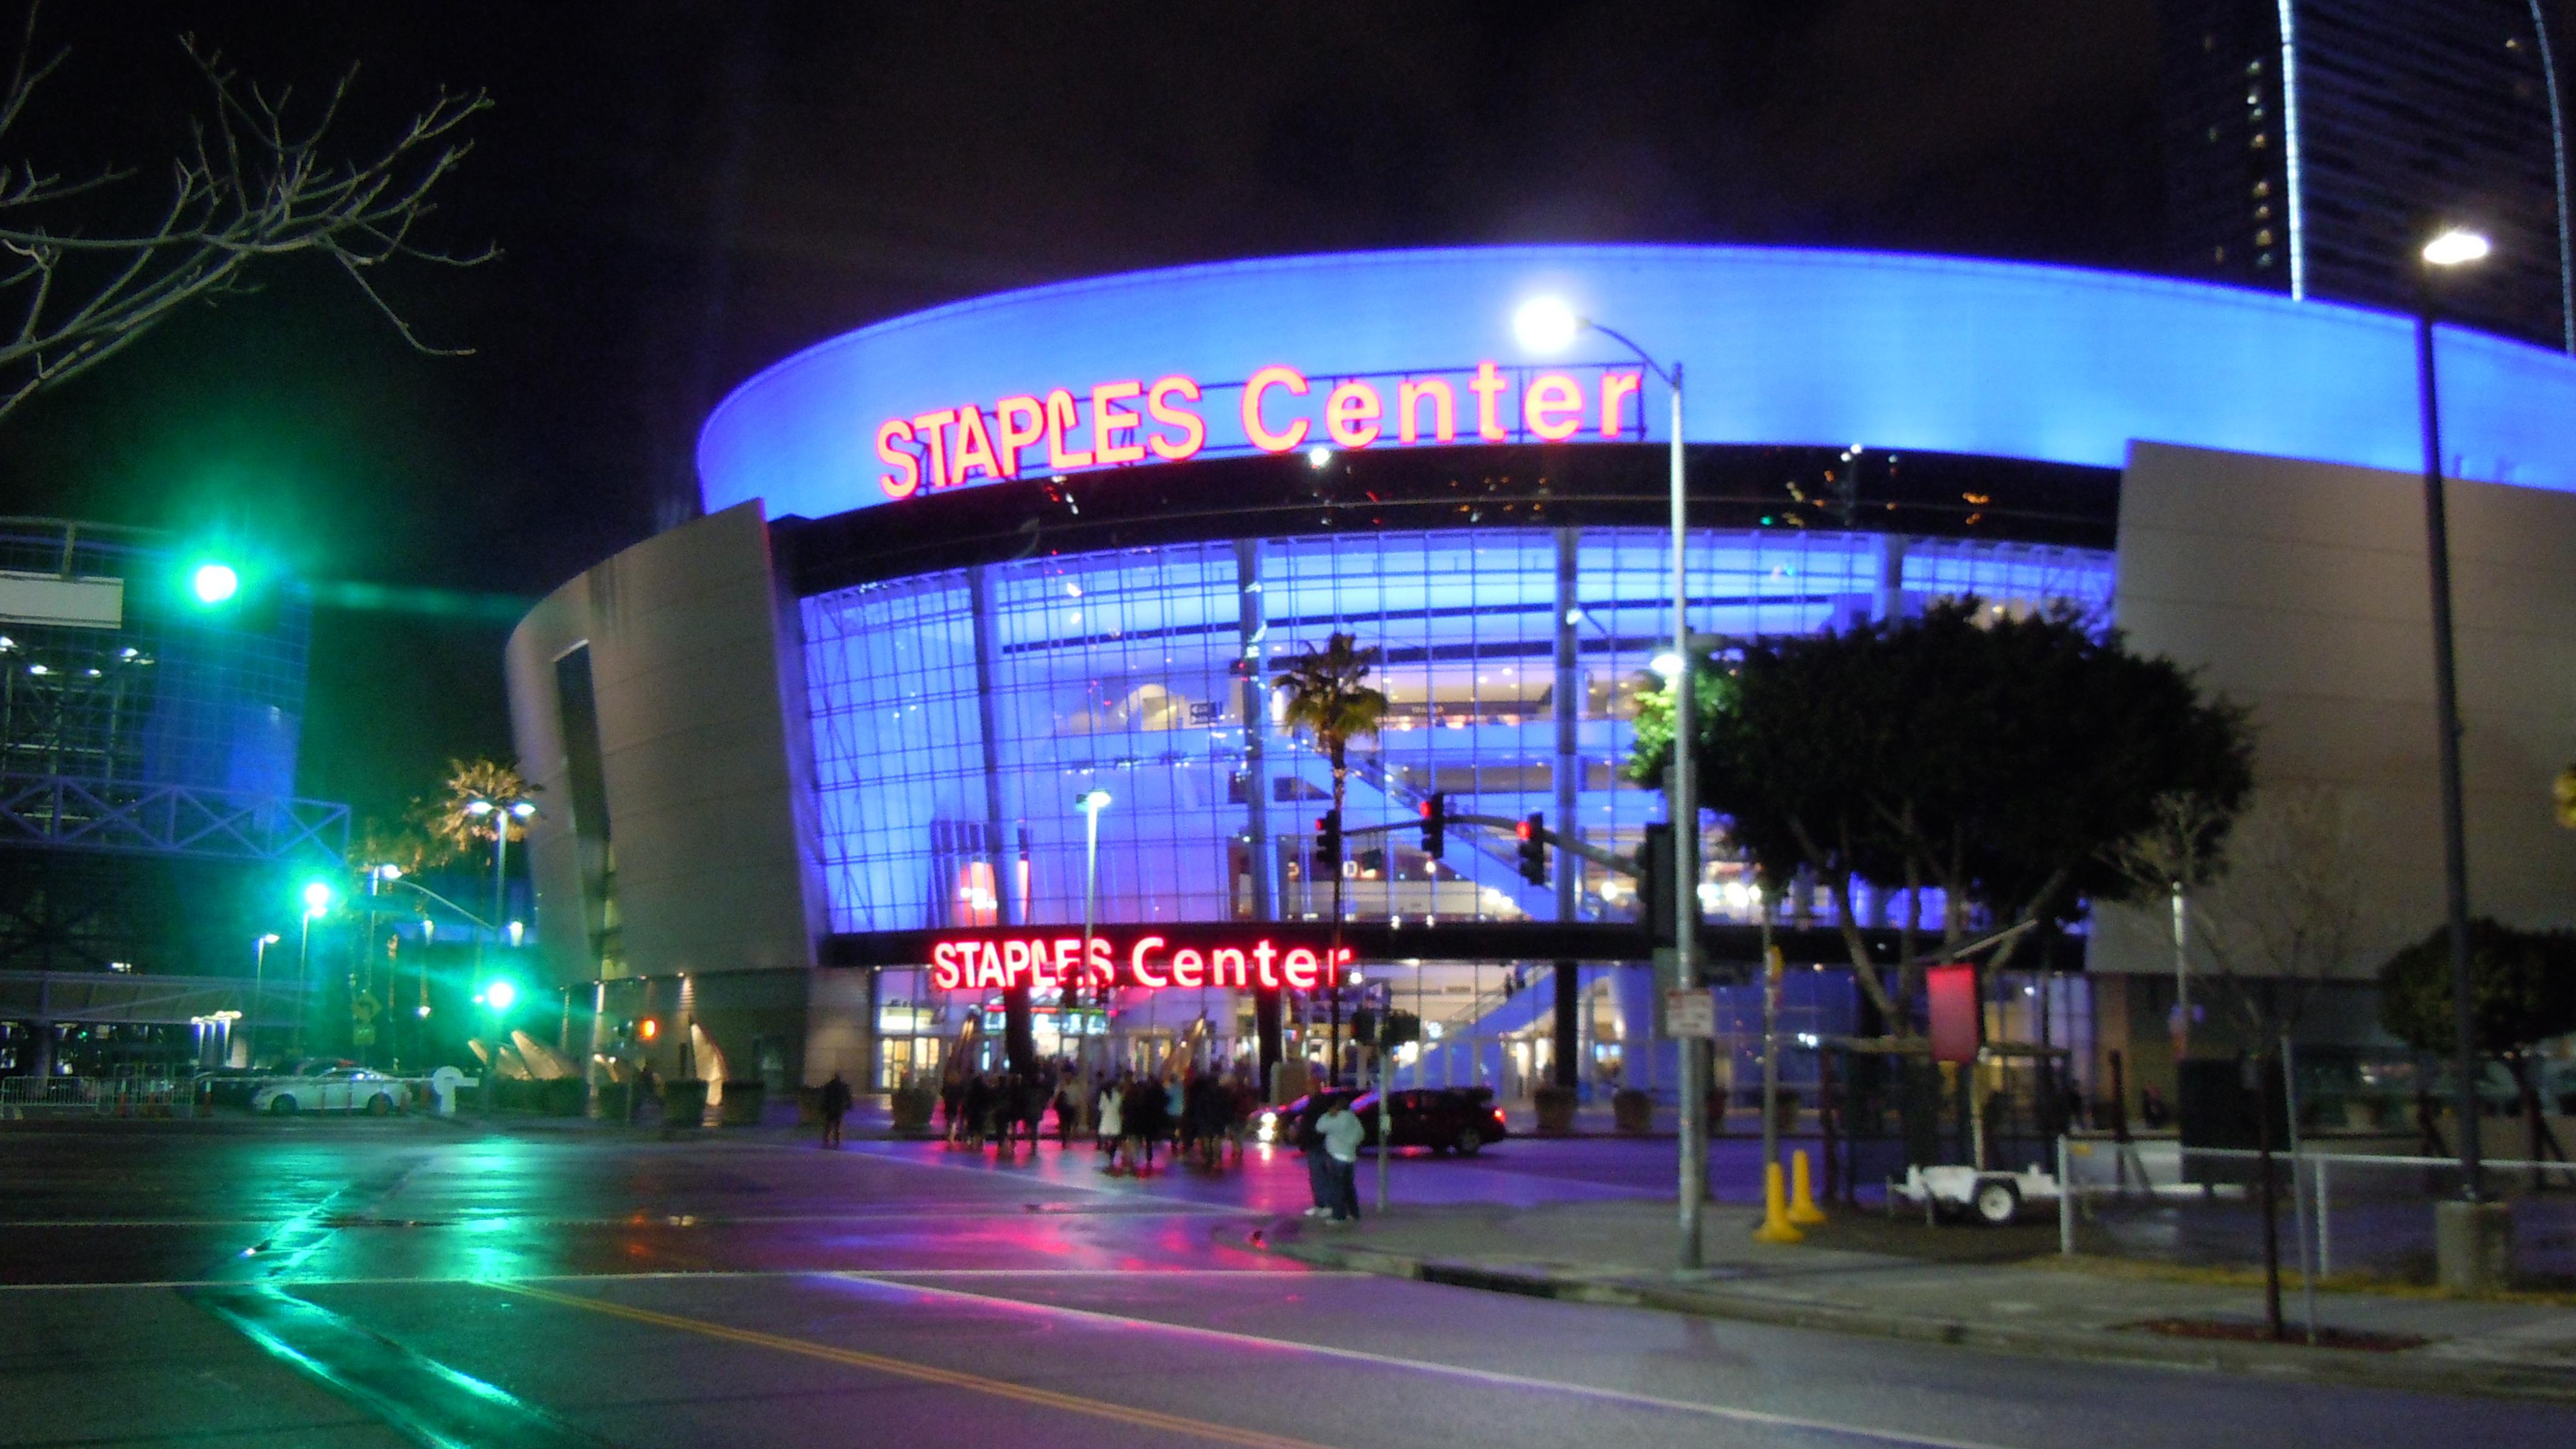 Staples Center The Frugal Fan